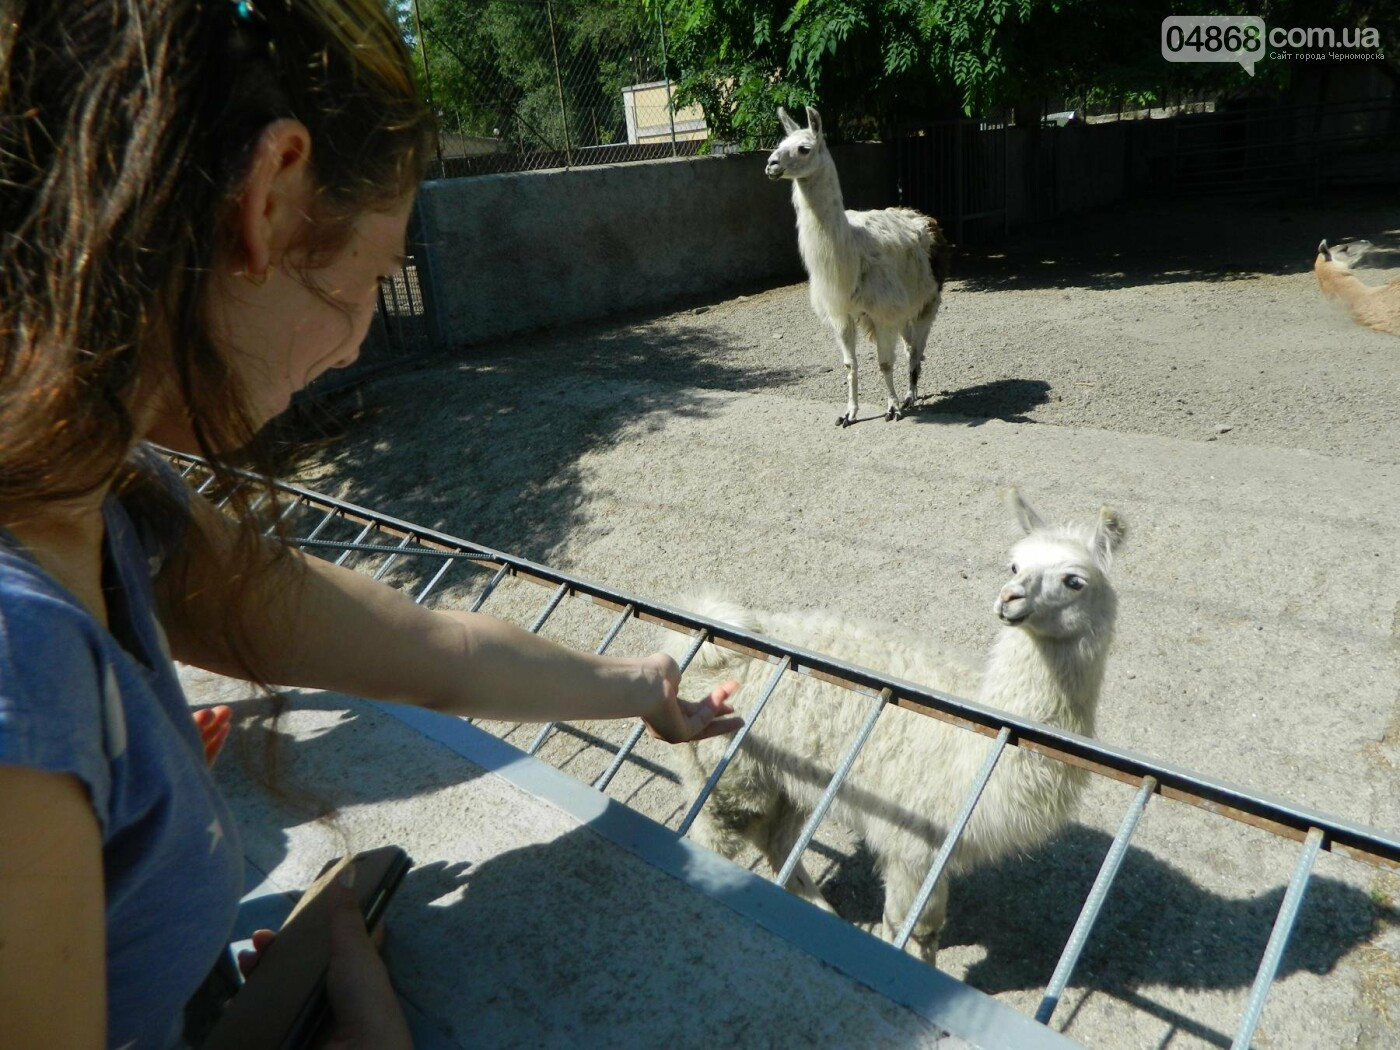 Дети из реабилитационного центра «Радуга» посетили зоопарк, фото-8